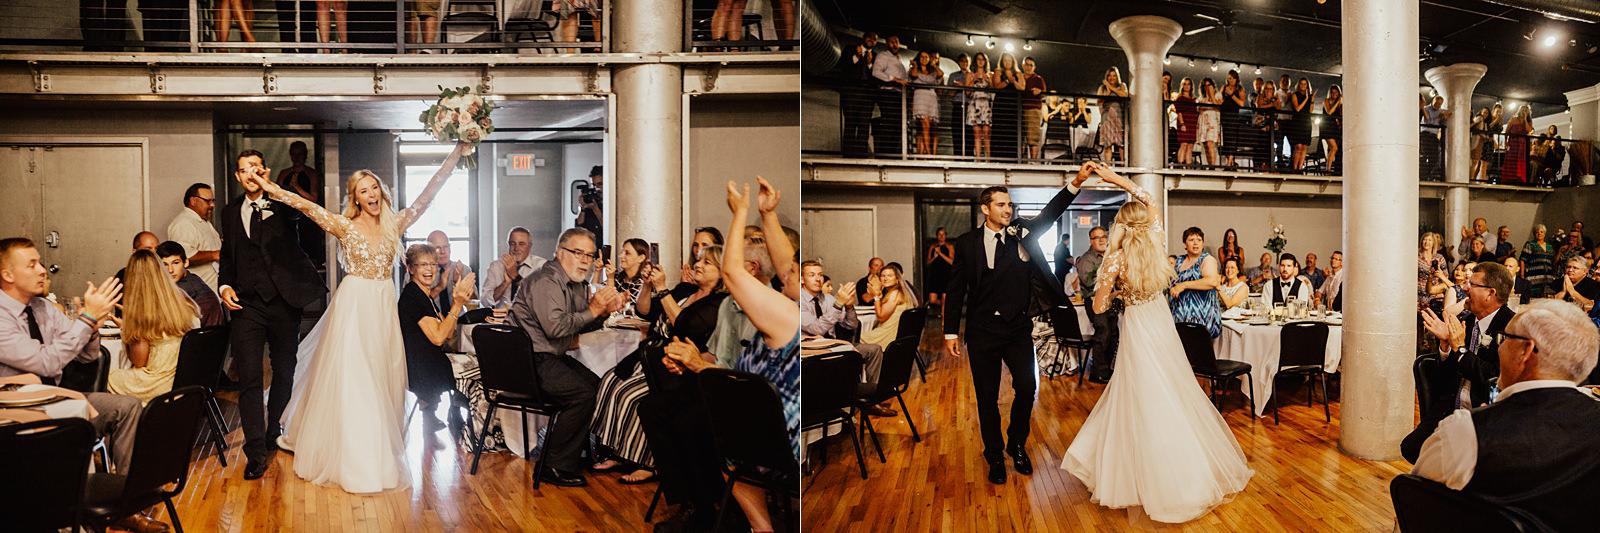 Molly & Bradley Modern Boho Wedding at The University Club Quad Cities-44.jpg